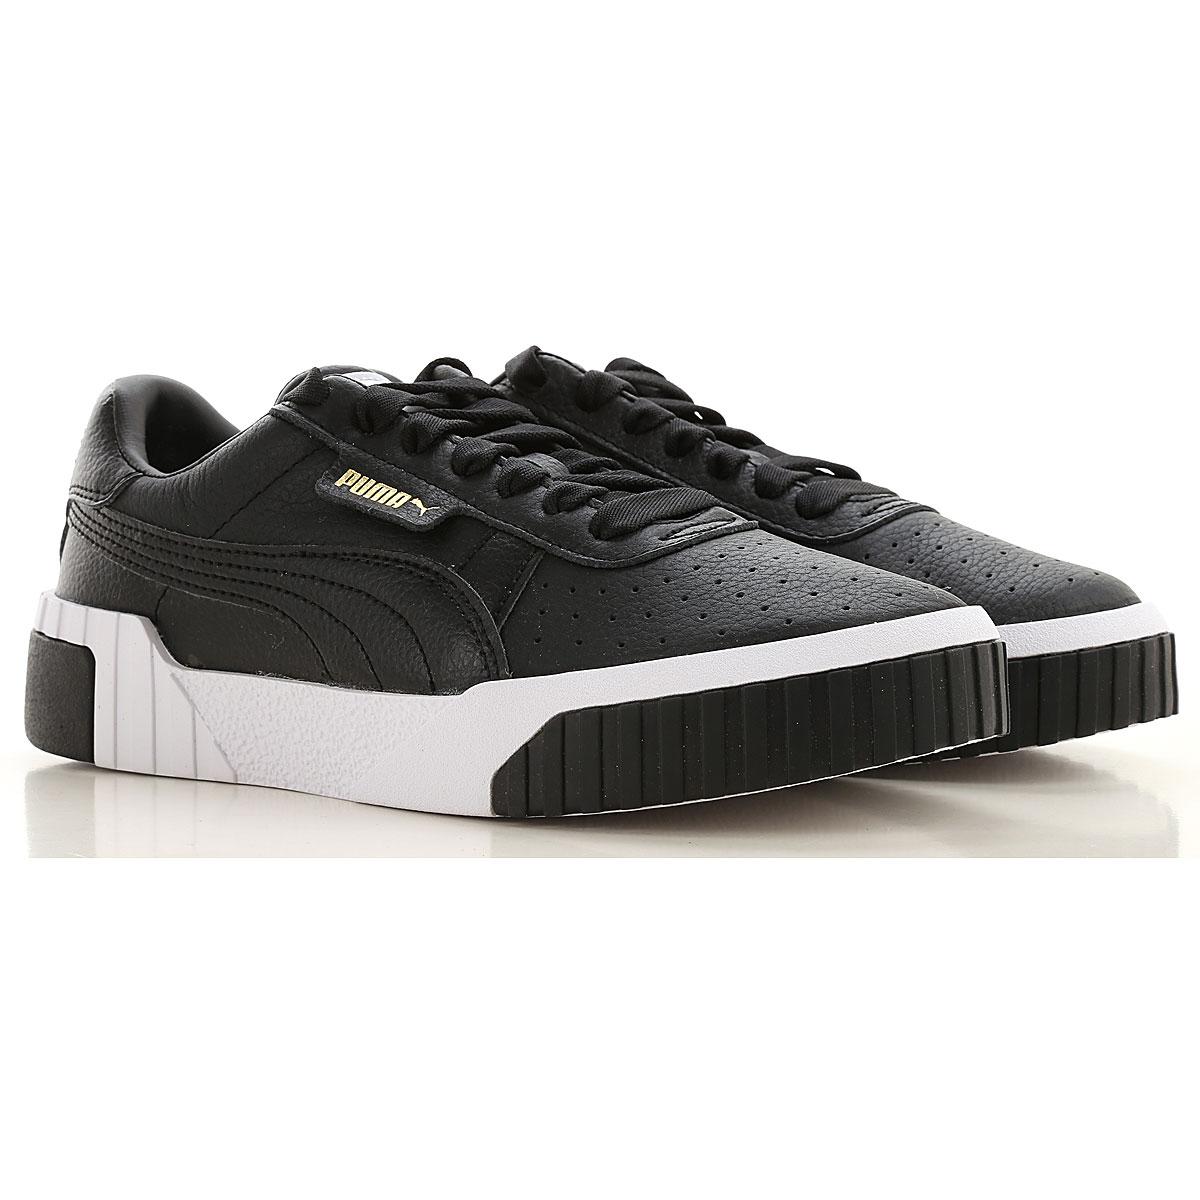 Puma Sneakers for Women On Sale in Outlet, Black, Eco Leather, 2019, US 6 5 - UK 4 - EU 37 - JP 23 US 7 - UK 4 5 - EU 37 5 - JP 23 5